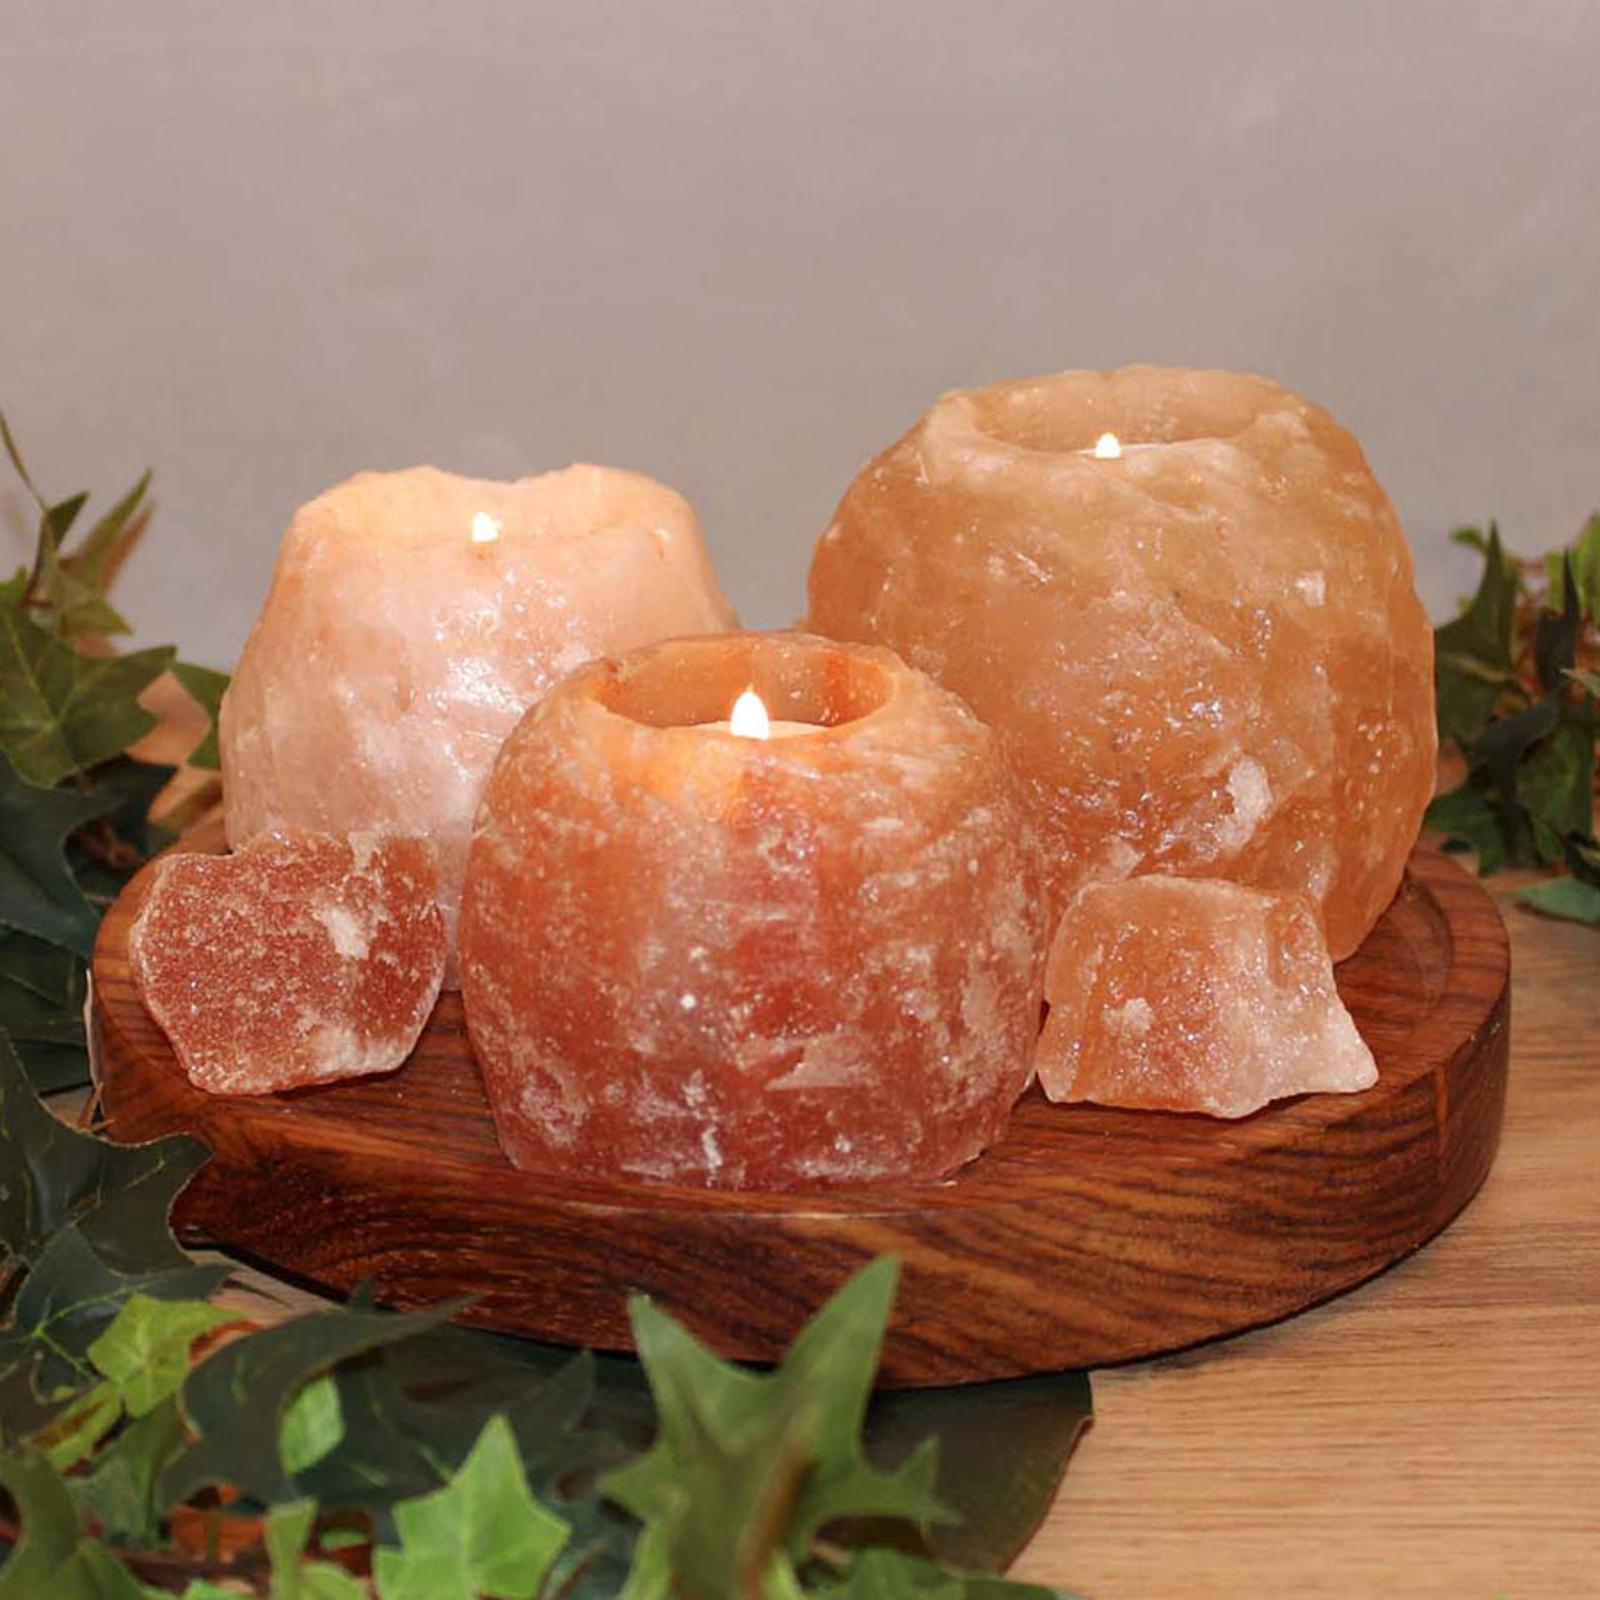 Lot support à bougie chauffe-plat Rock cristal sel